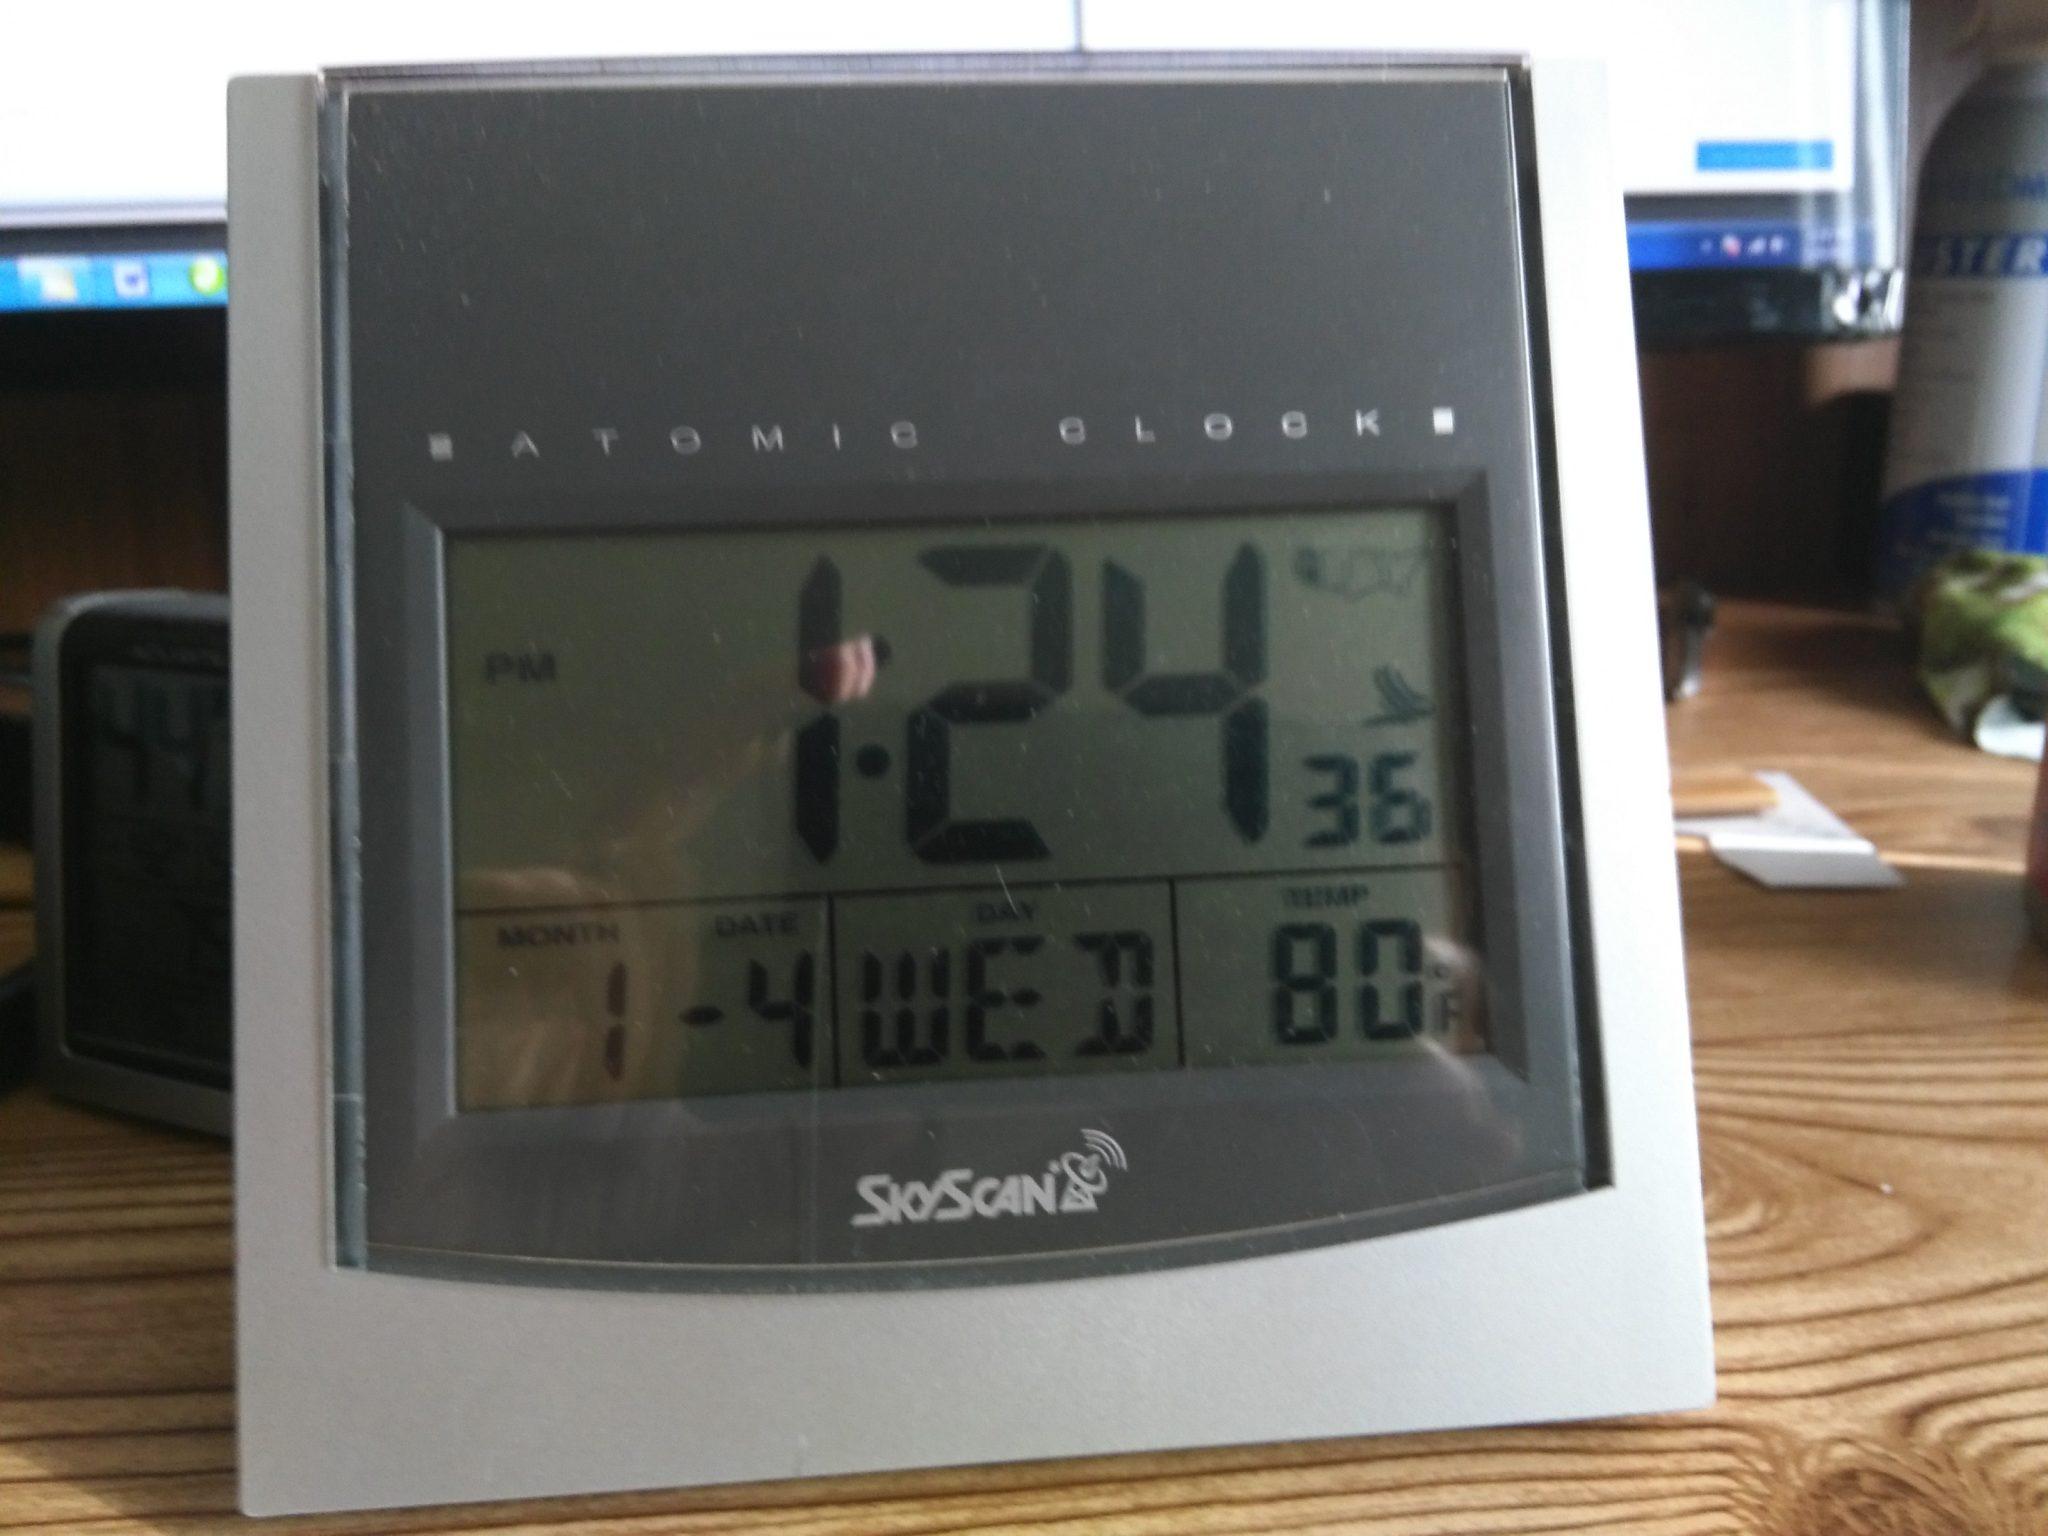 SkyScan 86742 adjusting the clock